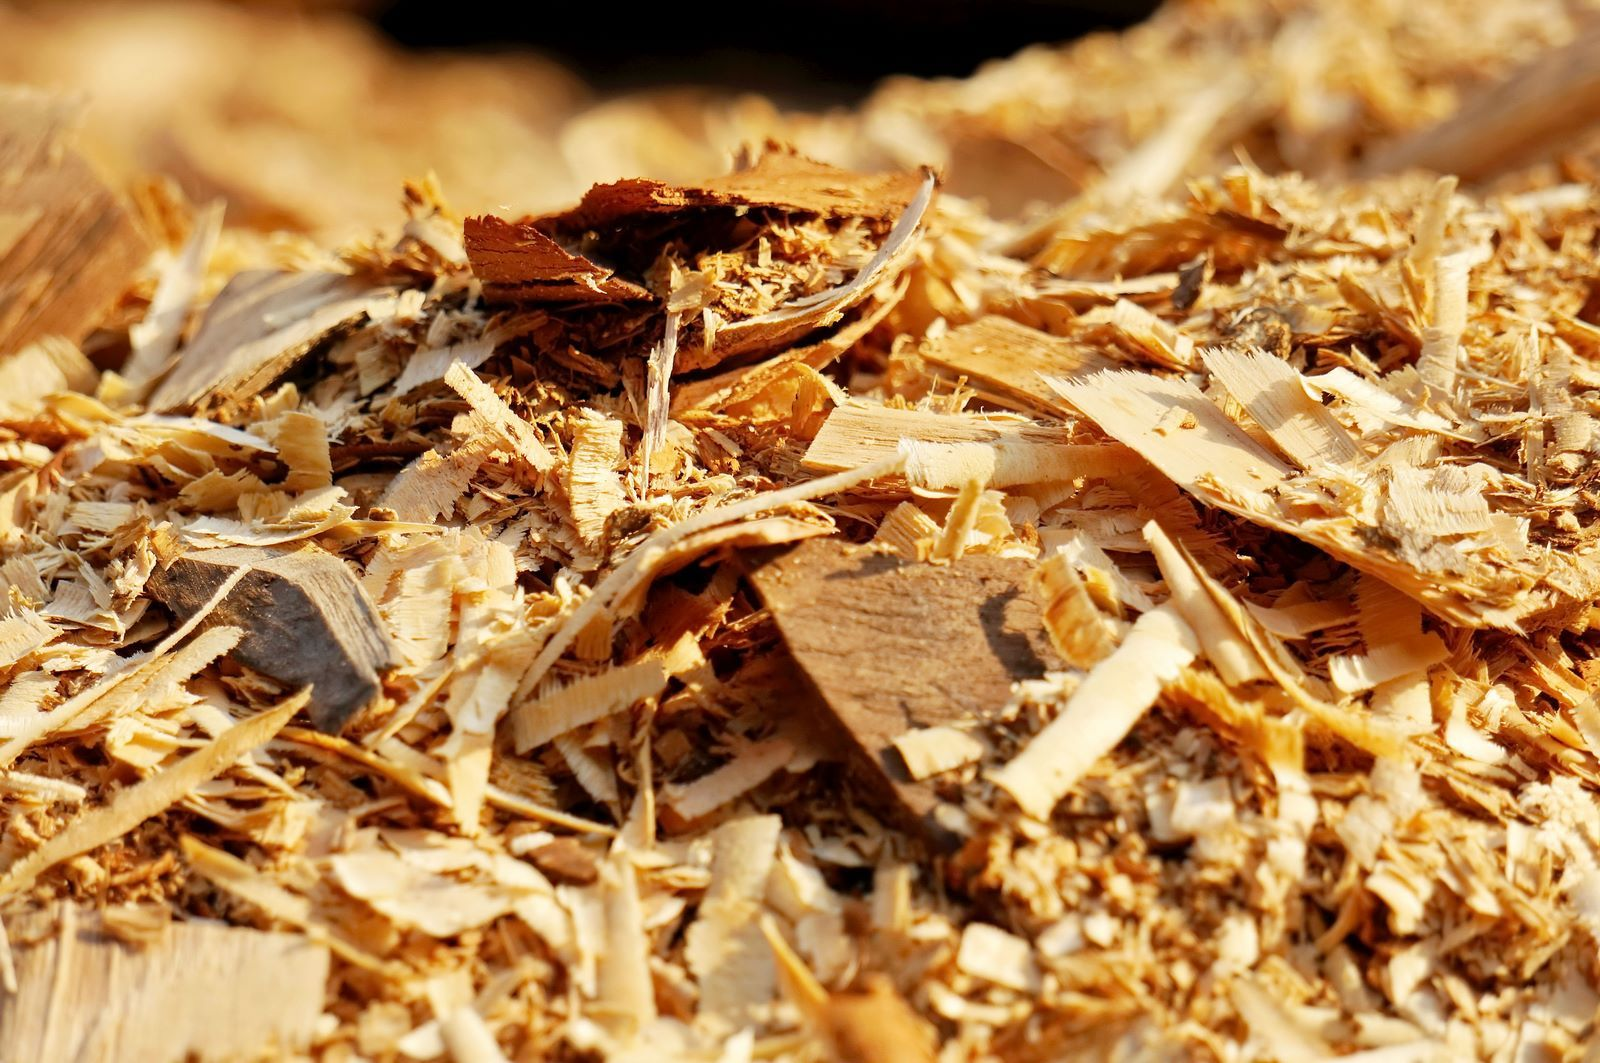 vendita trucioli legno depolverati mantova